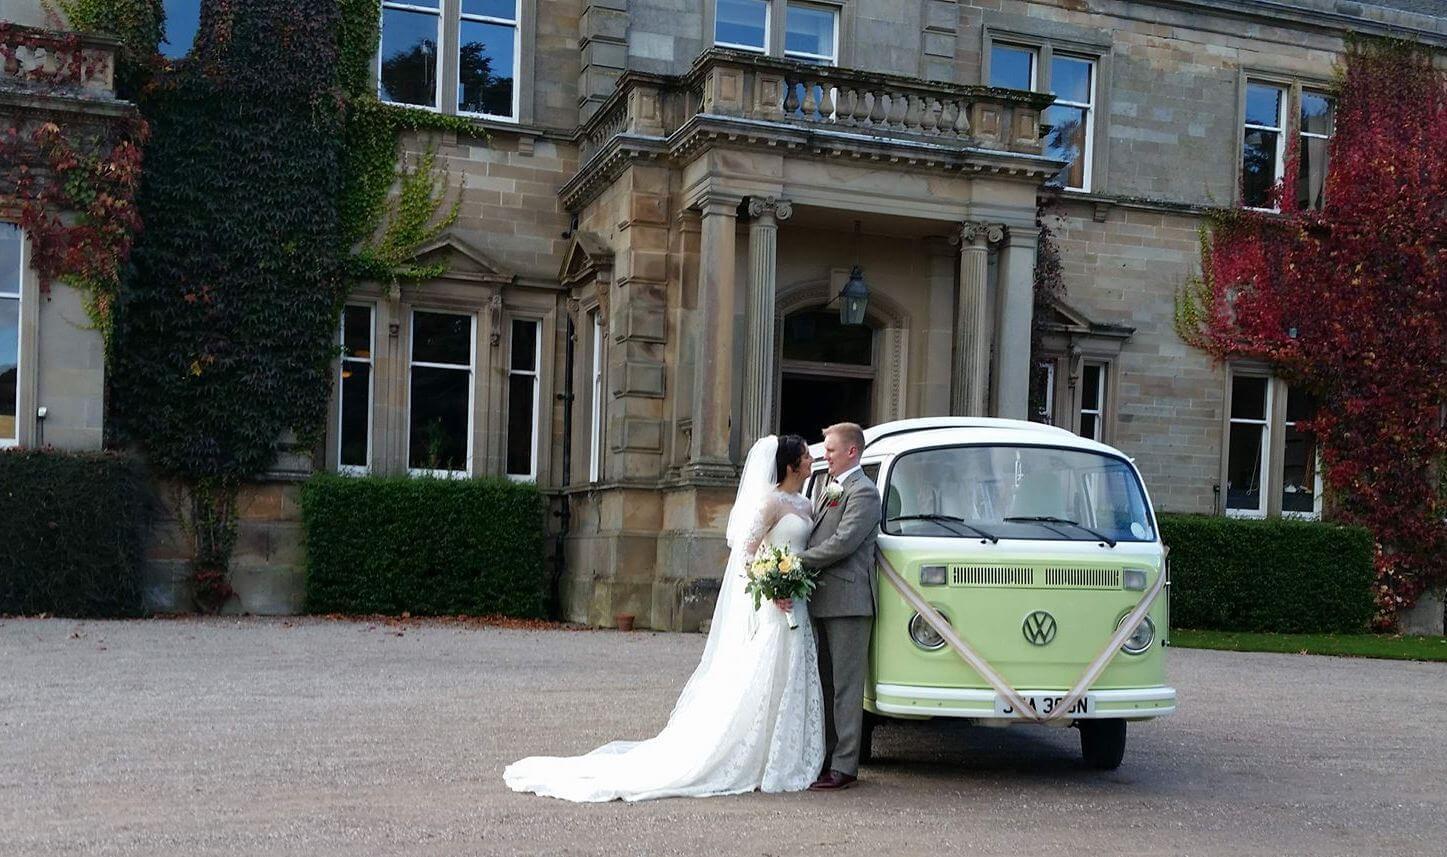 VW-camper-wedding-car-moomin-2.jpg